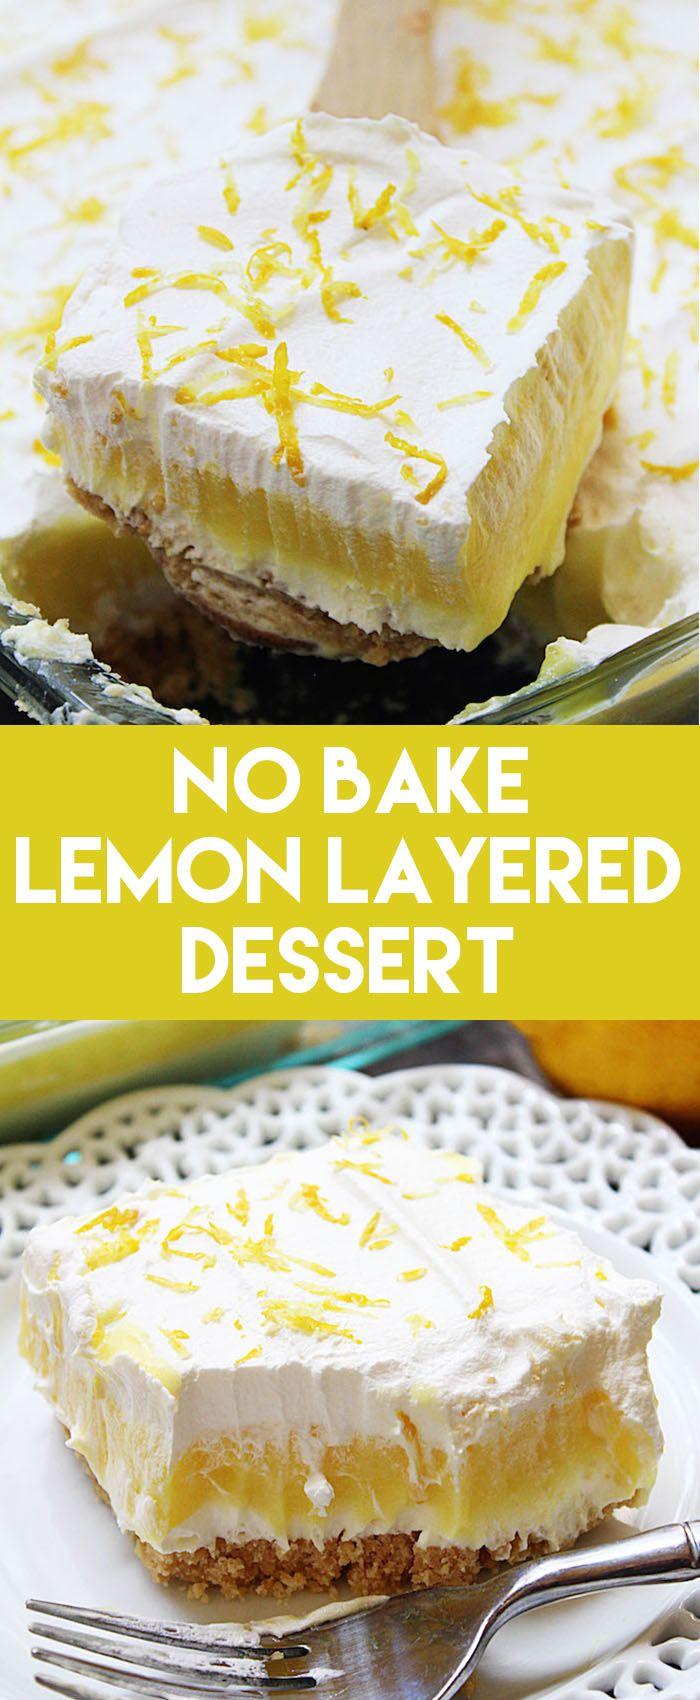 Golden Oreos, cheesecake, lemon pudding, and whipped topping make this No Bake Lemon Layered Dessert taste awesome!